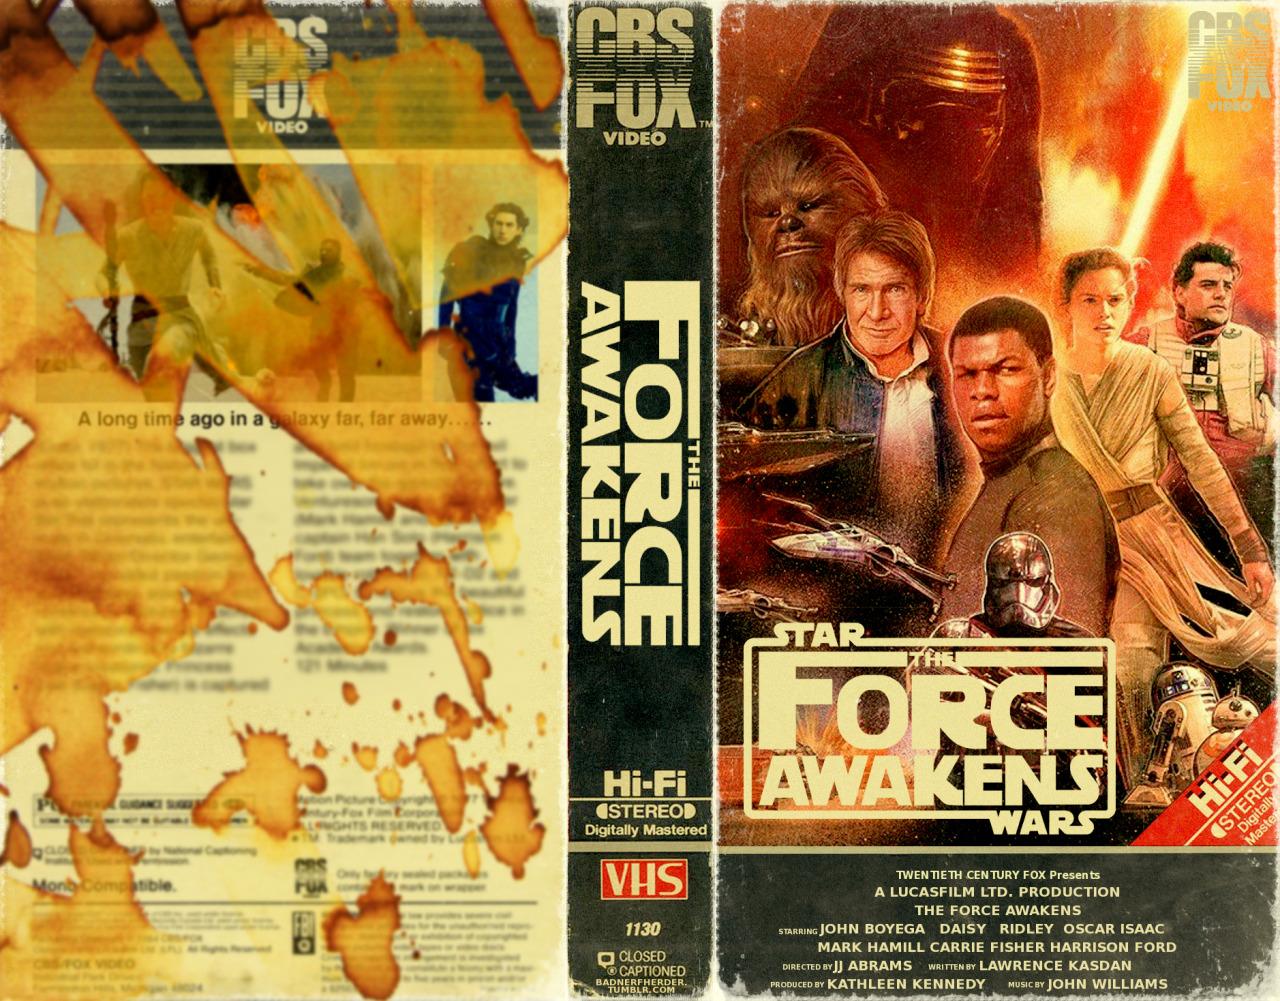 Art The Force Awakens Gets Vhs Box Art Courtesy Of Paul